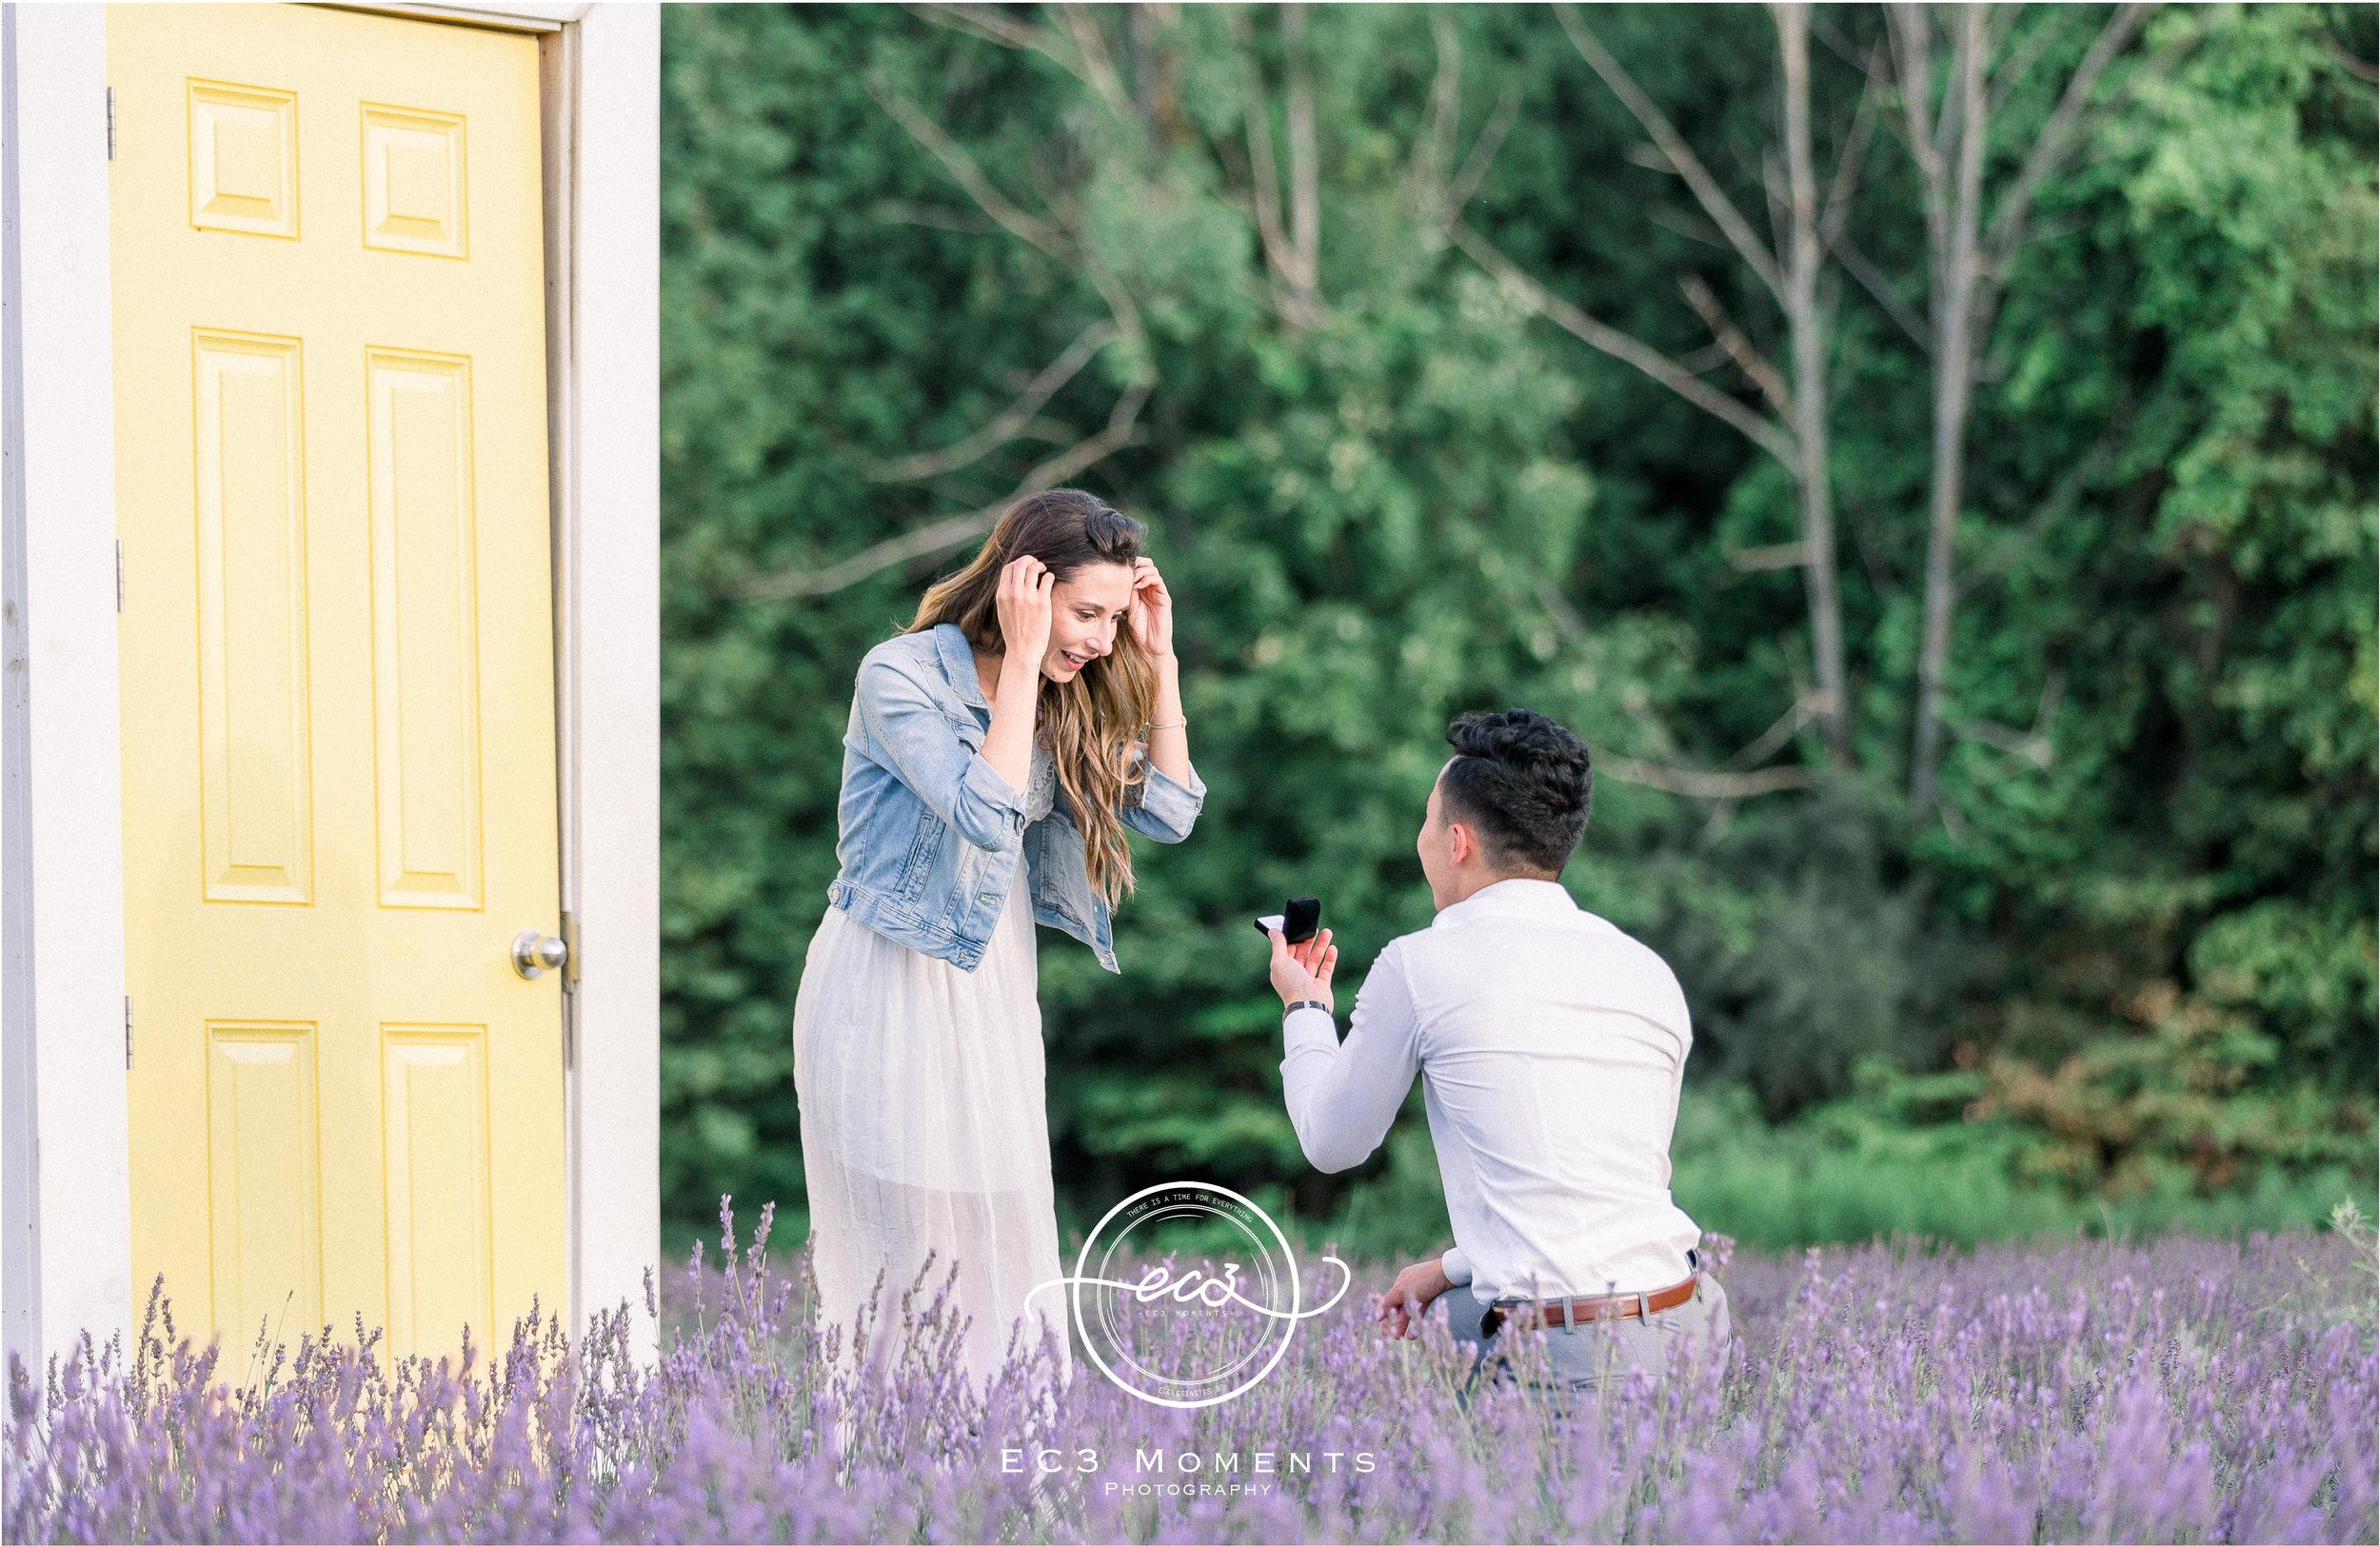 Laura & Ryan Terre Bleu Summer Surprise Proposal 9.jpg